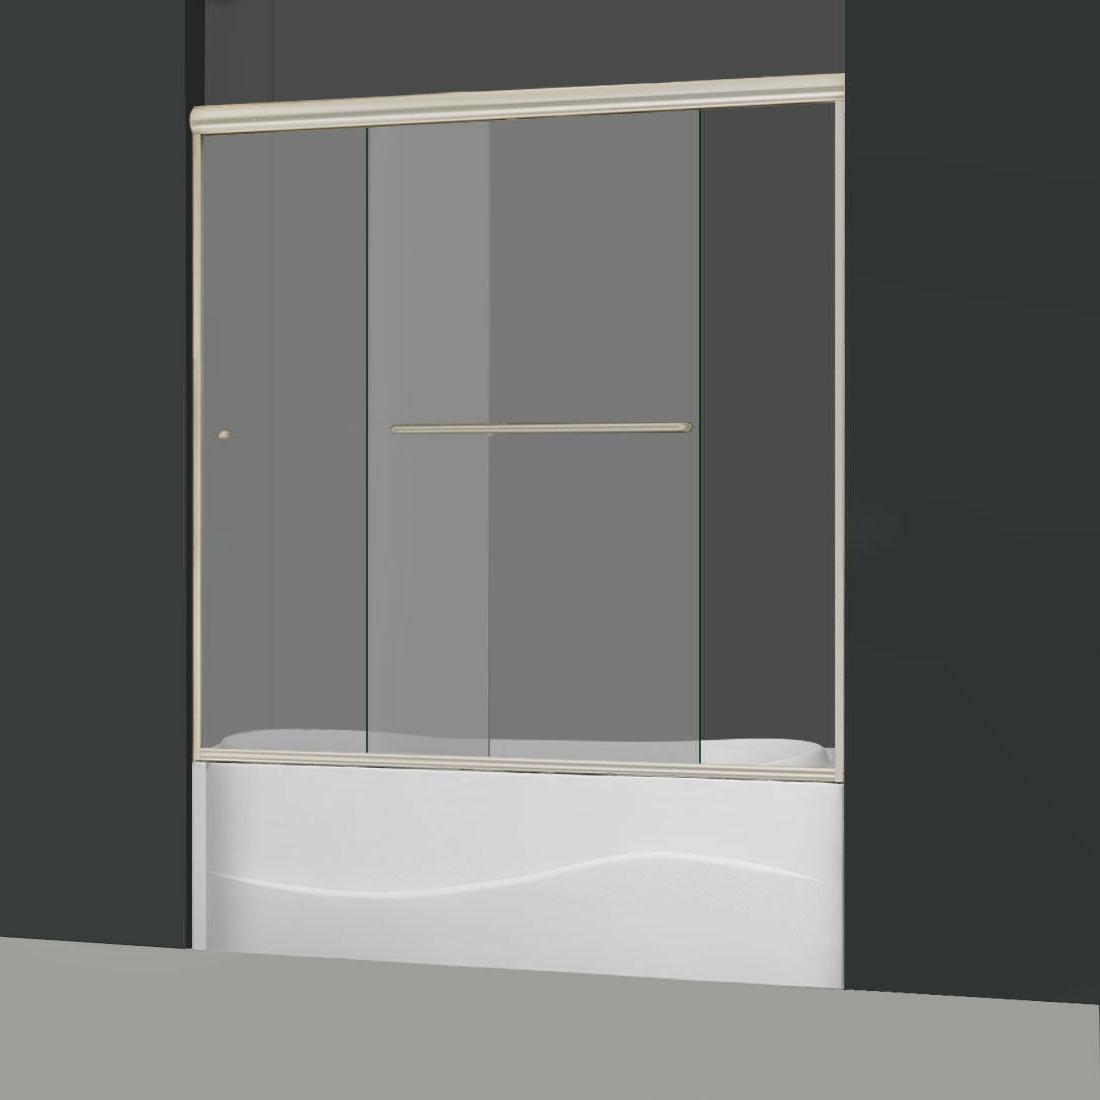 "ELEGANT Glass Tub Doors 58 1/2-60""W Brushed"